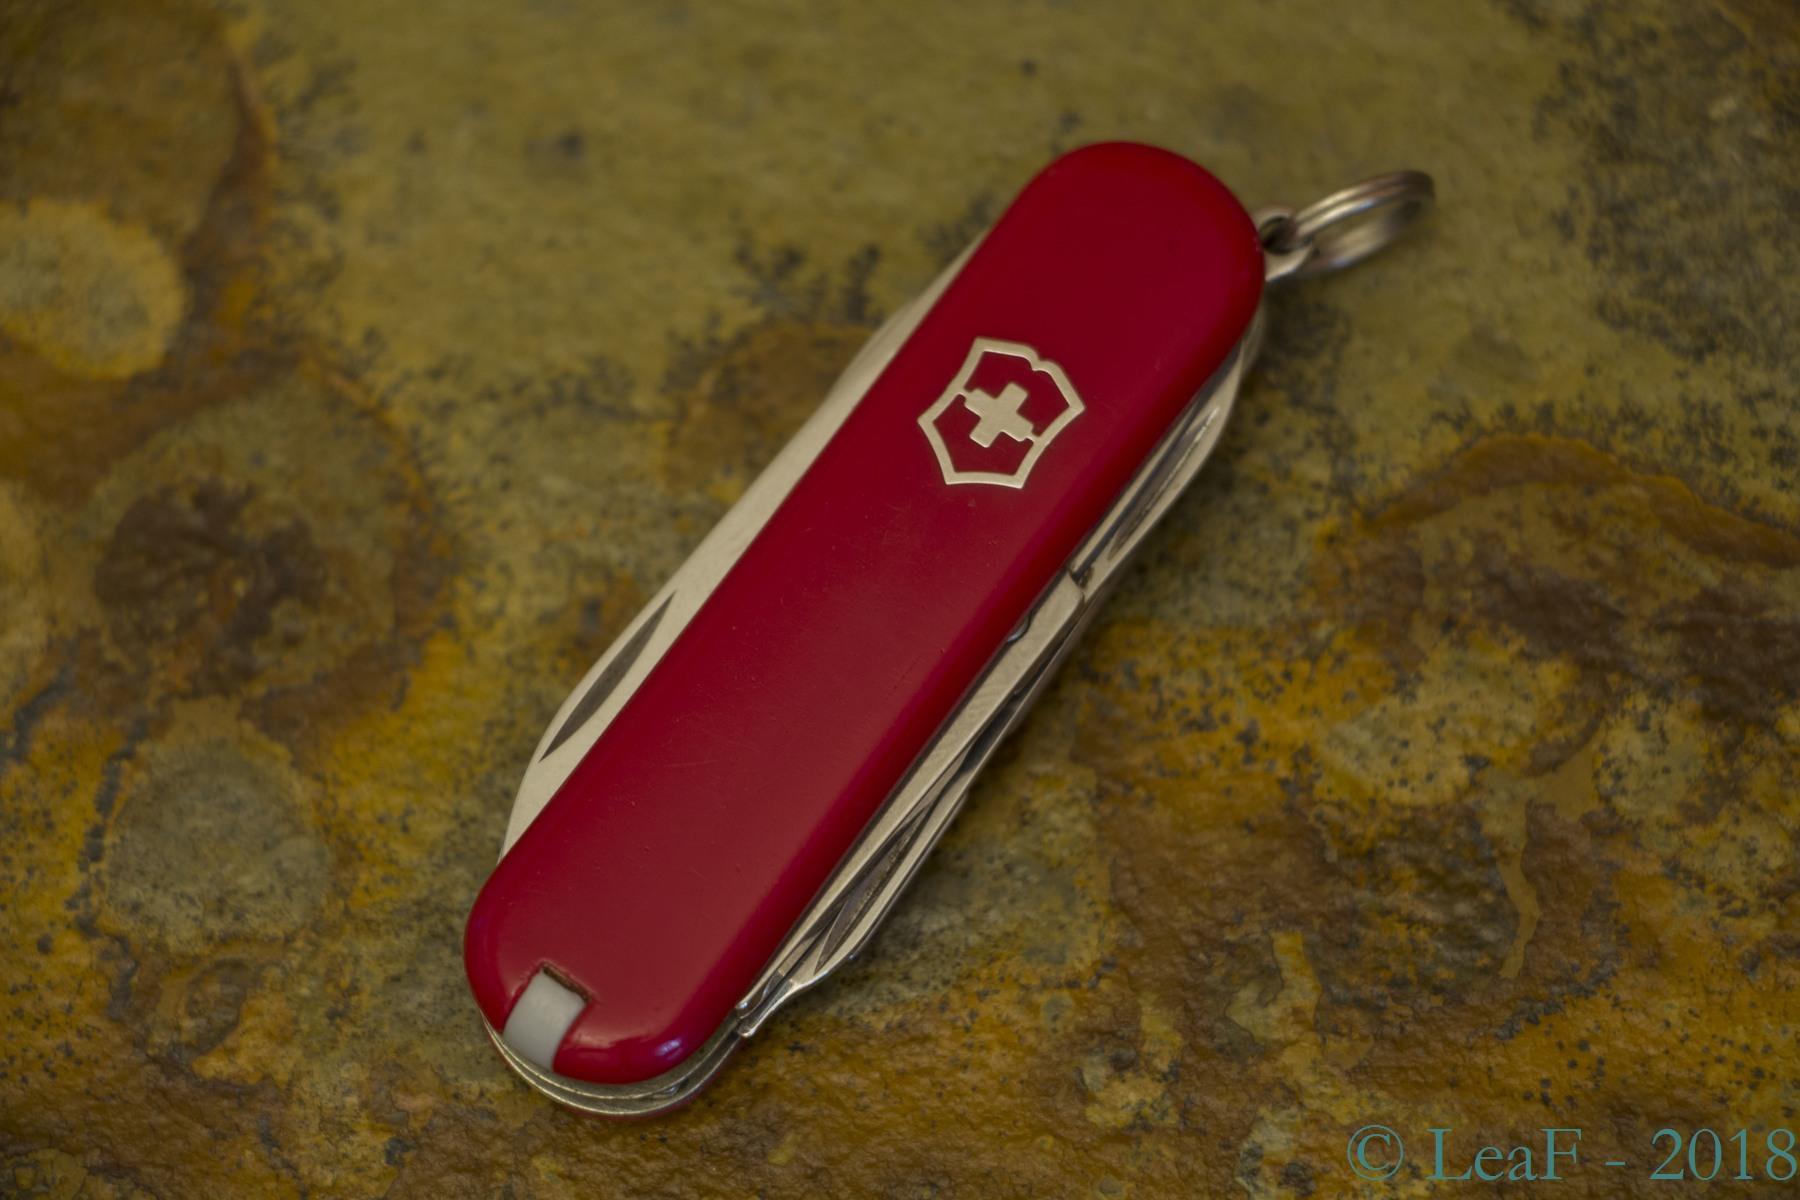 172 Minichamp I Leaf S Victorinox Knives Collection